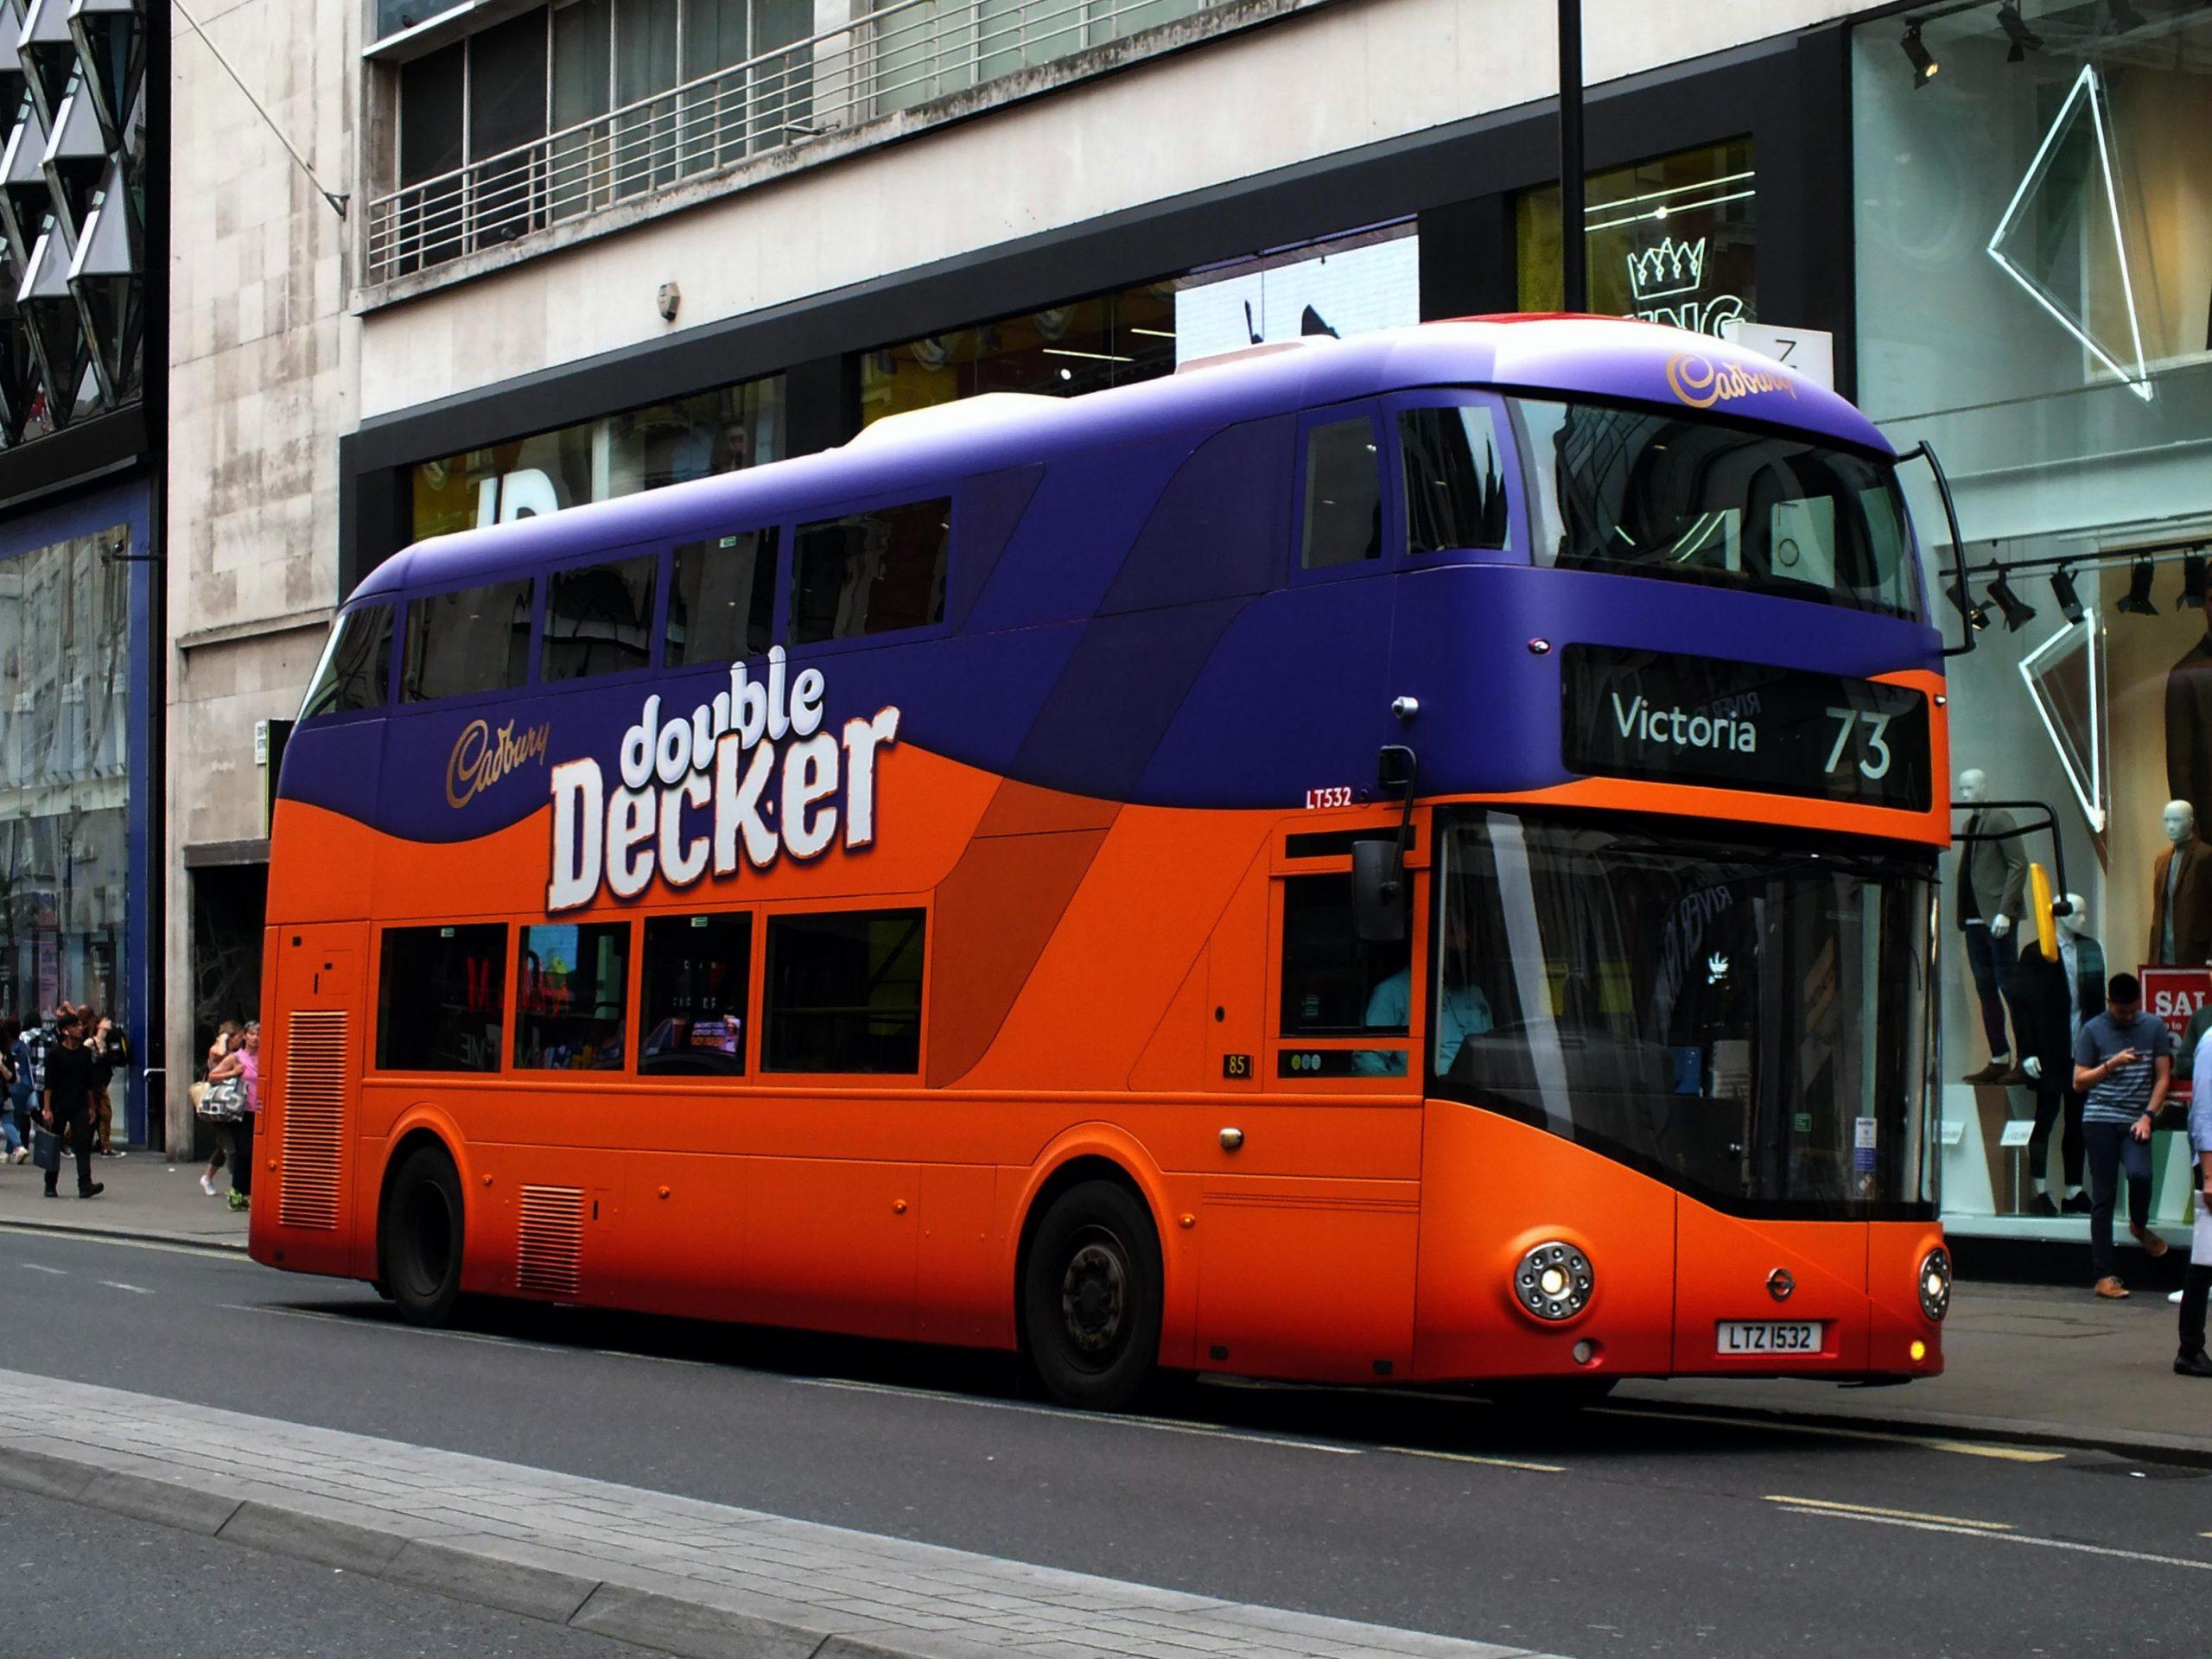 Cadbury Double Decker Bus